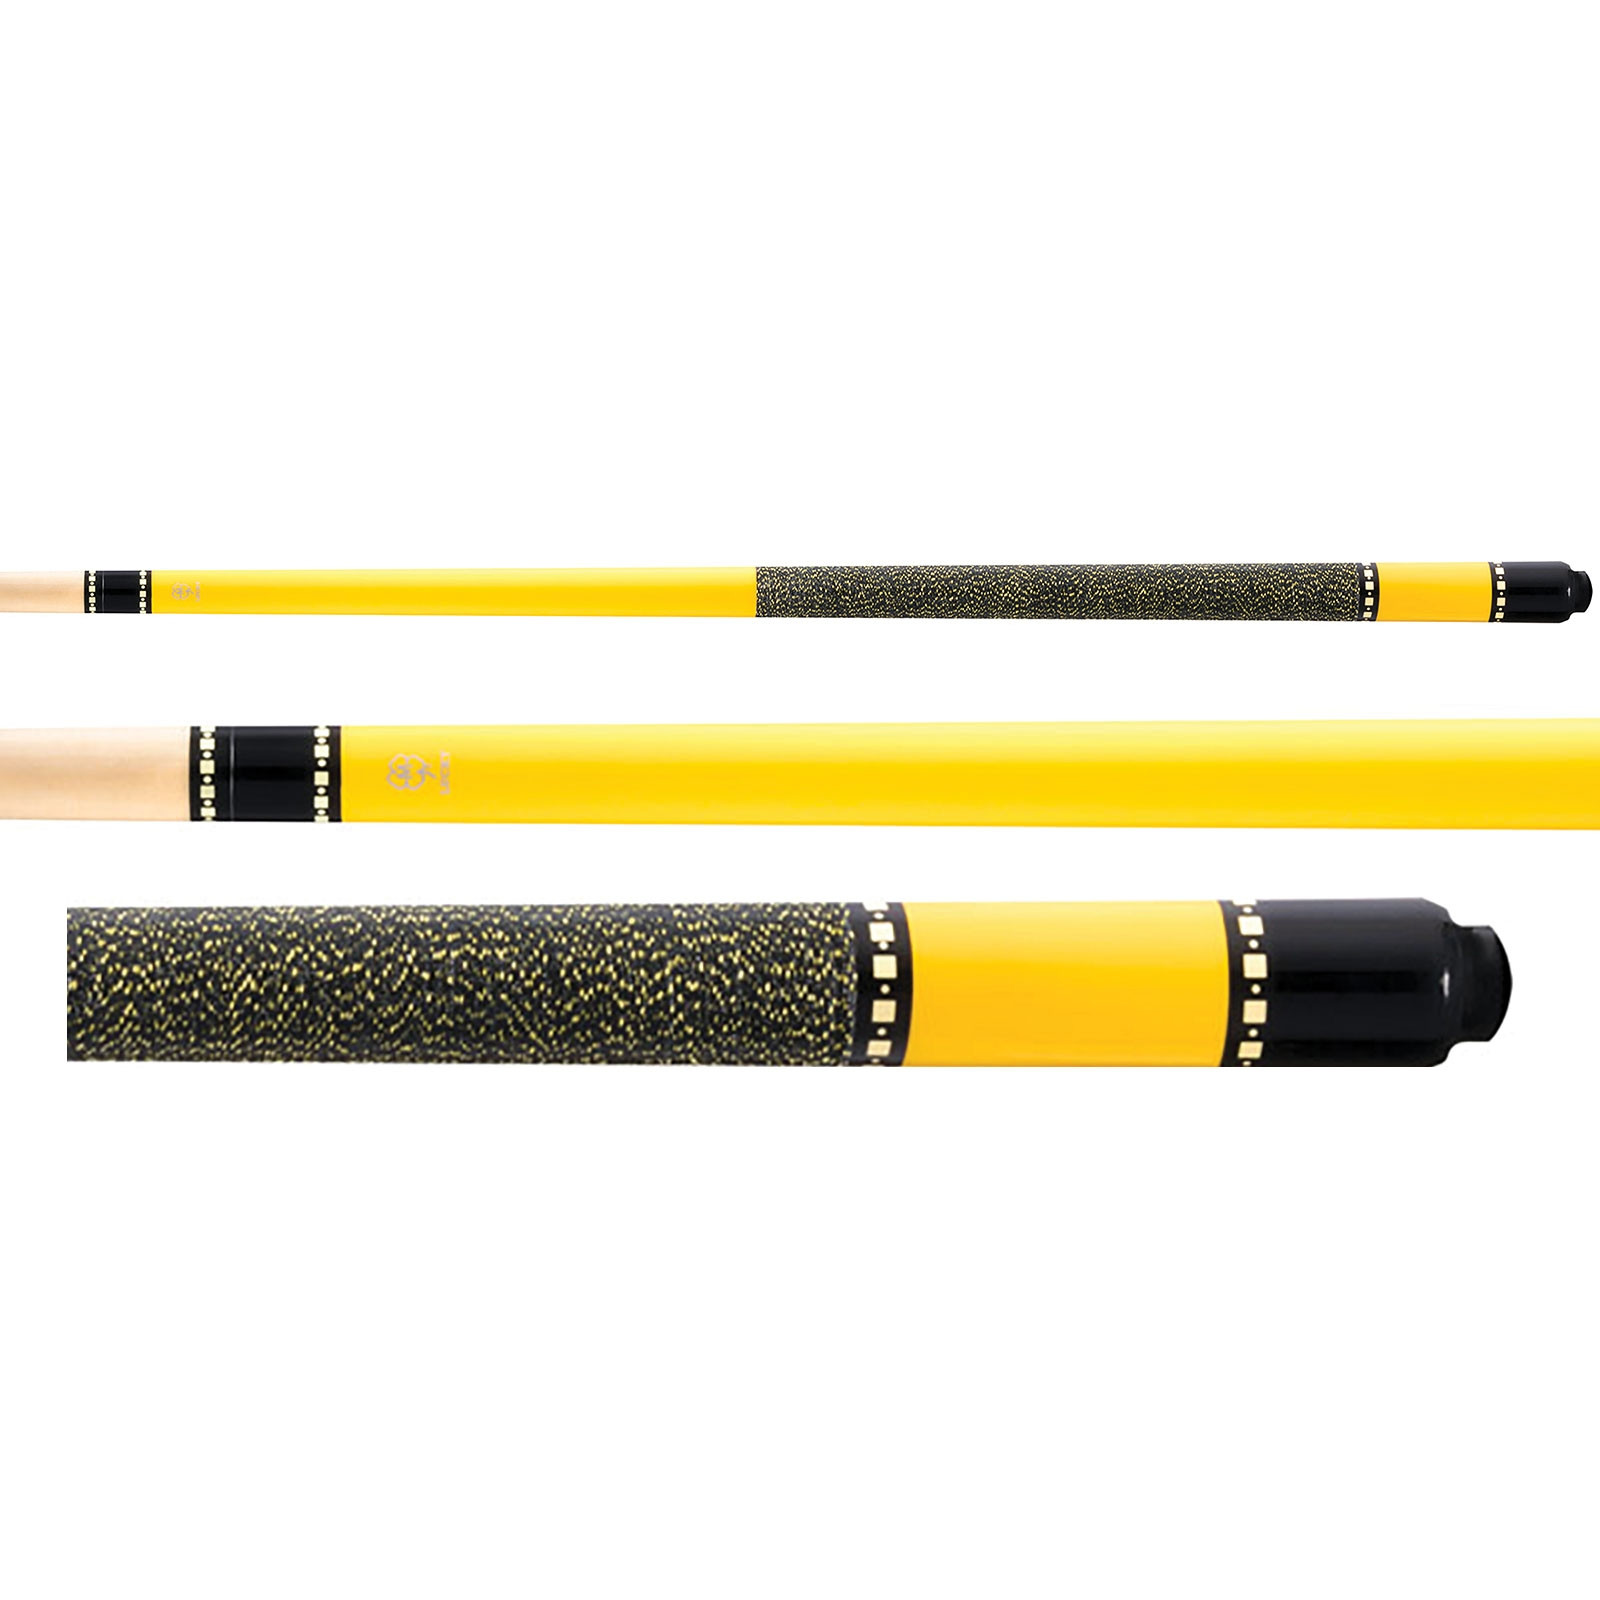 Brand New MCDERMOTT LUCKY L28 Two-piece Billiard Pool Cue Stick /& FREE SOFT CASE